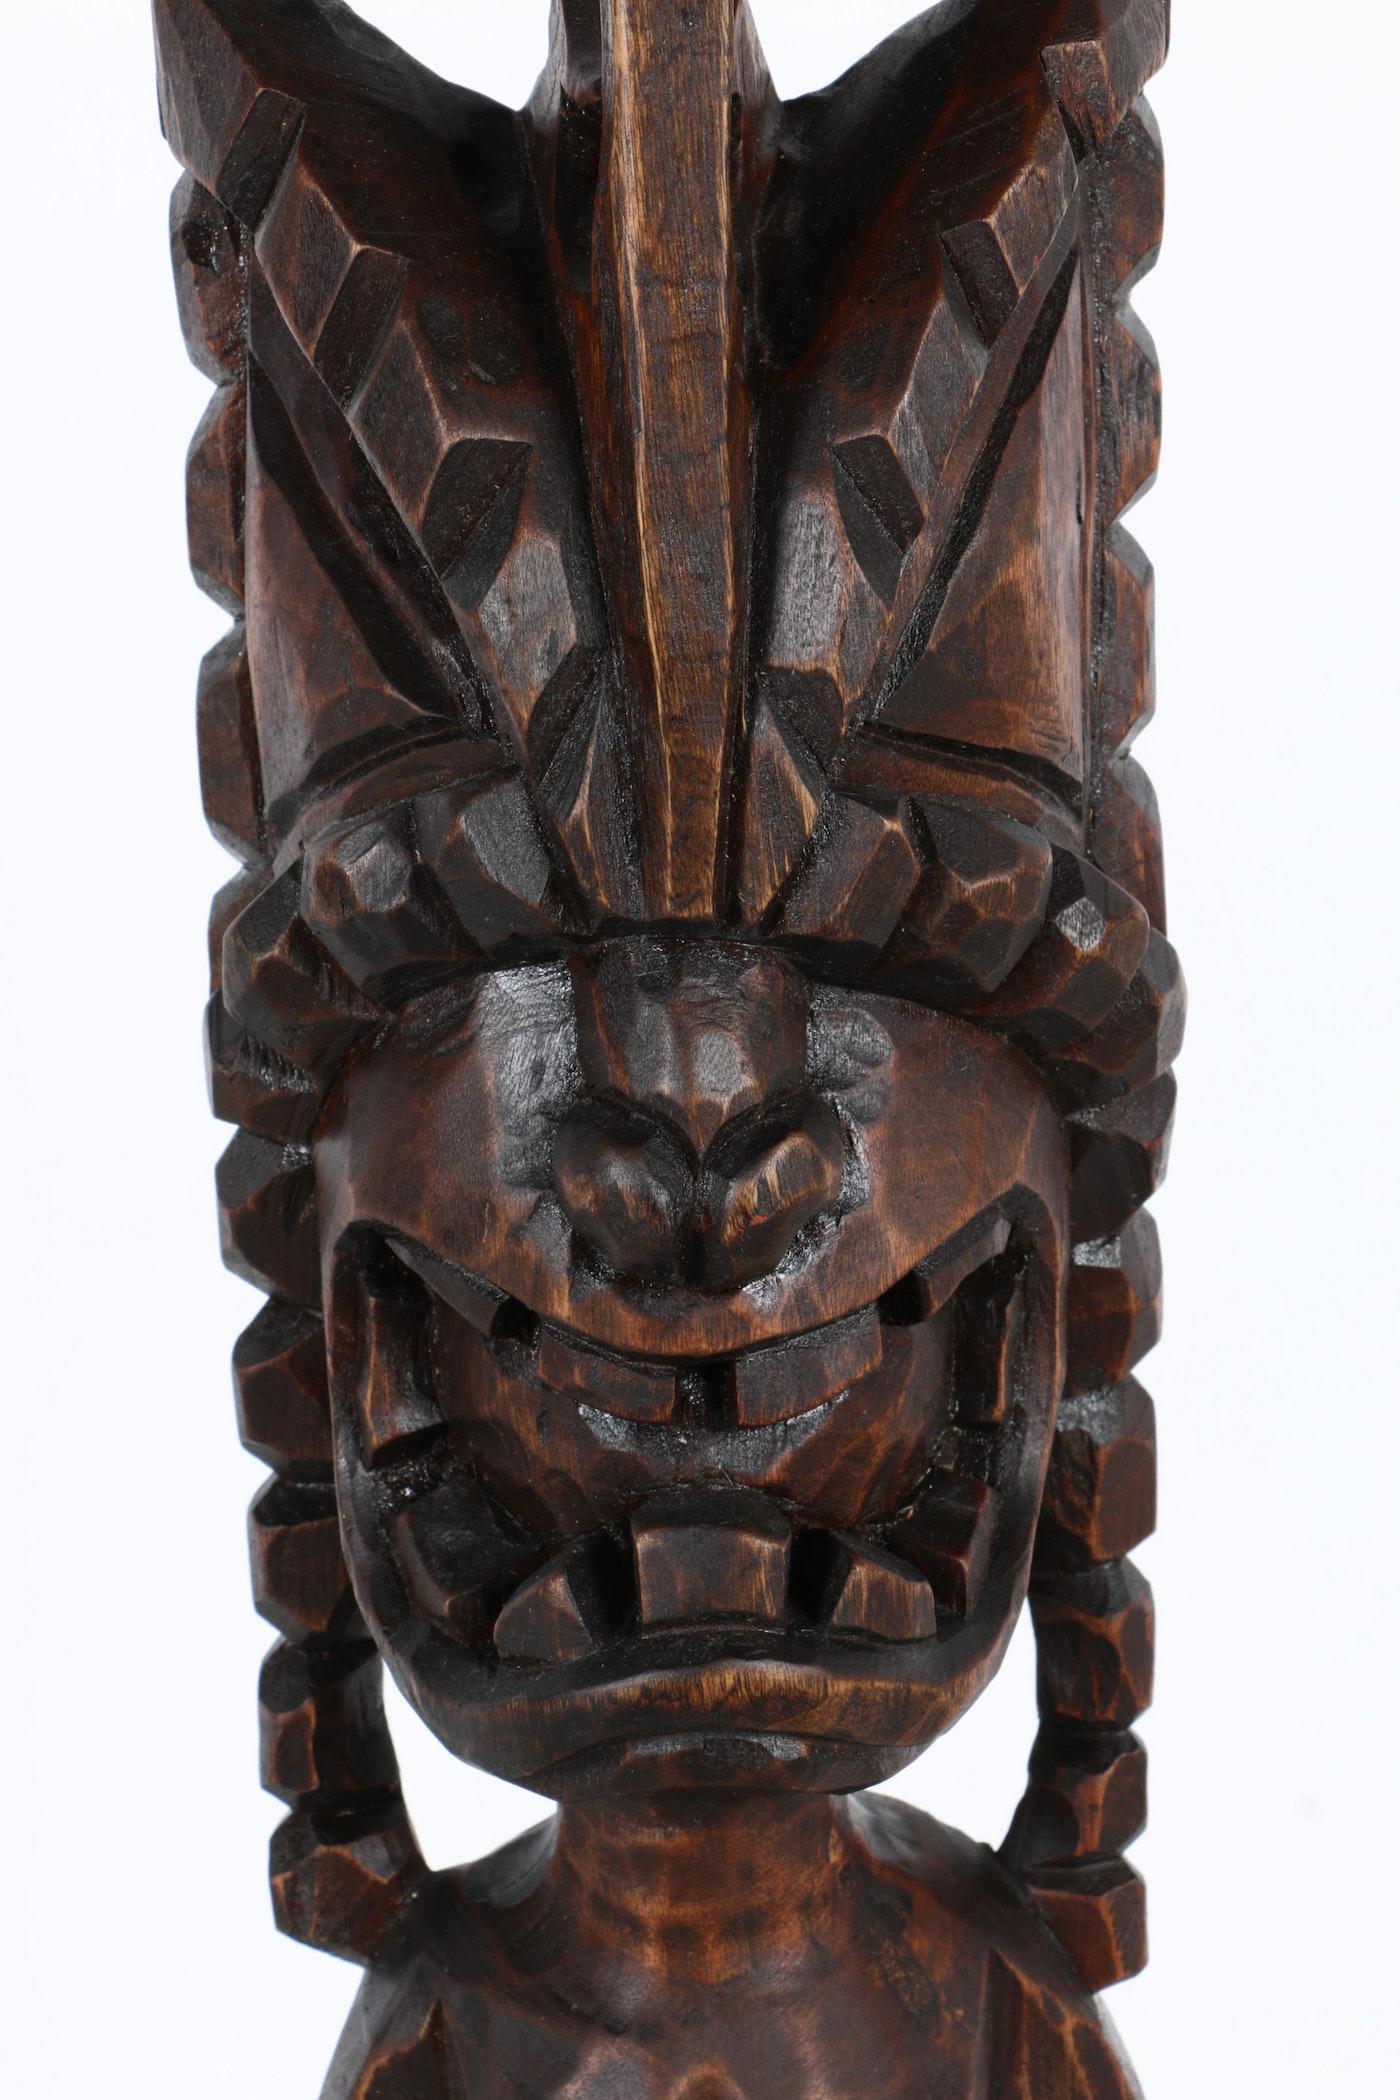 Hawaiian style carved wood lono sculpture ebth